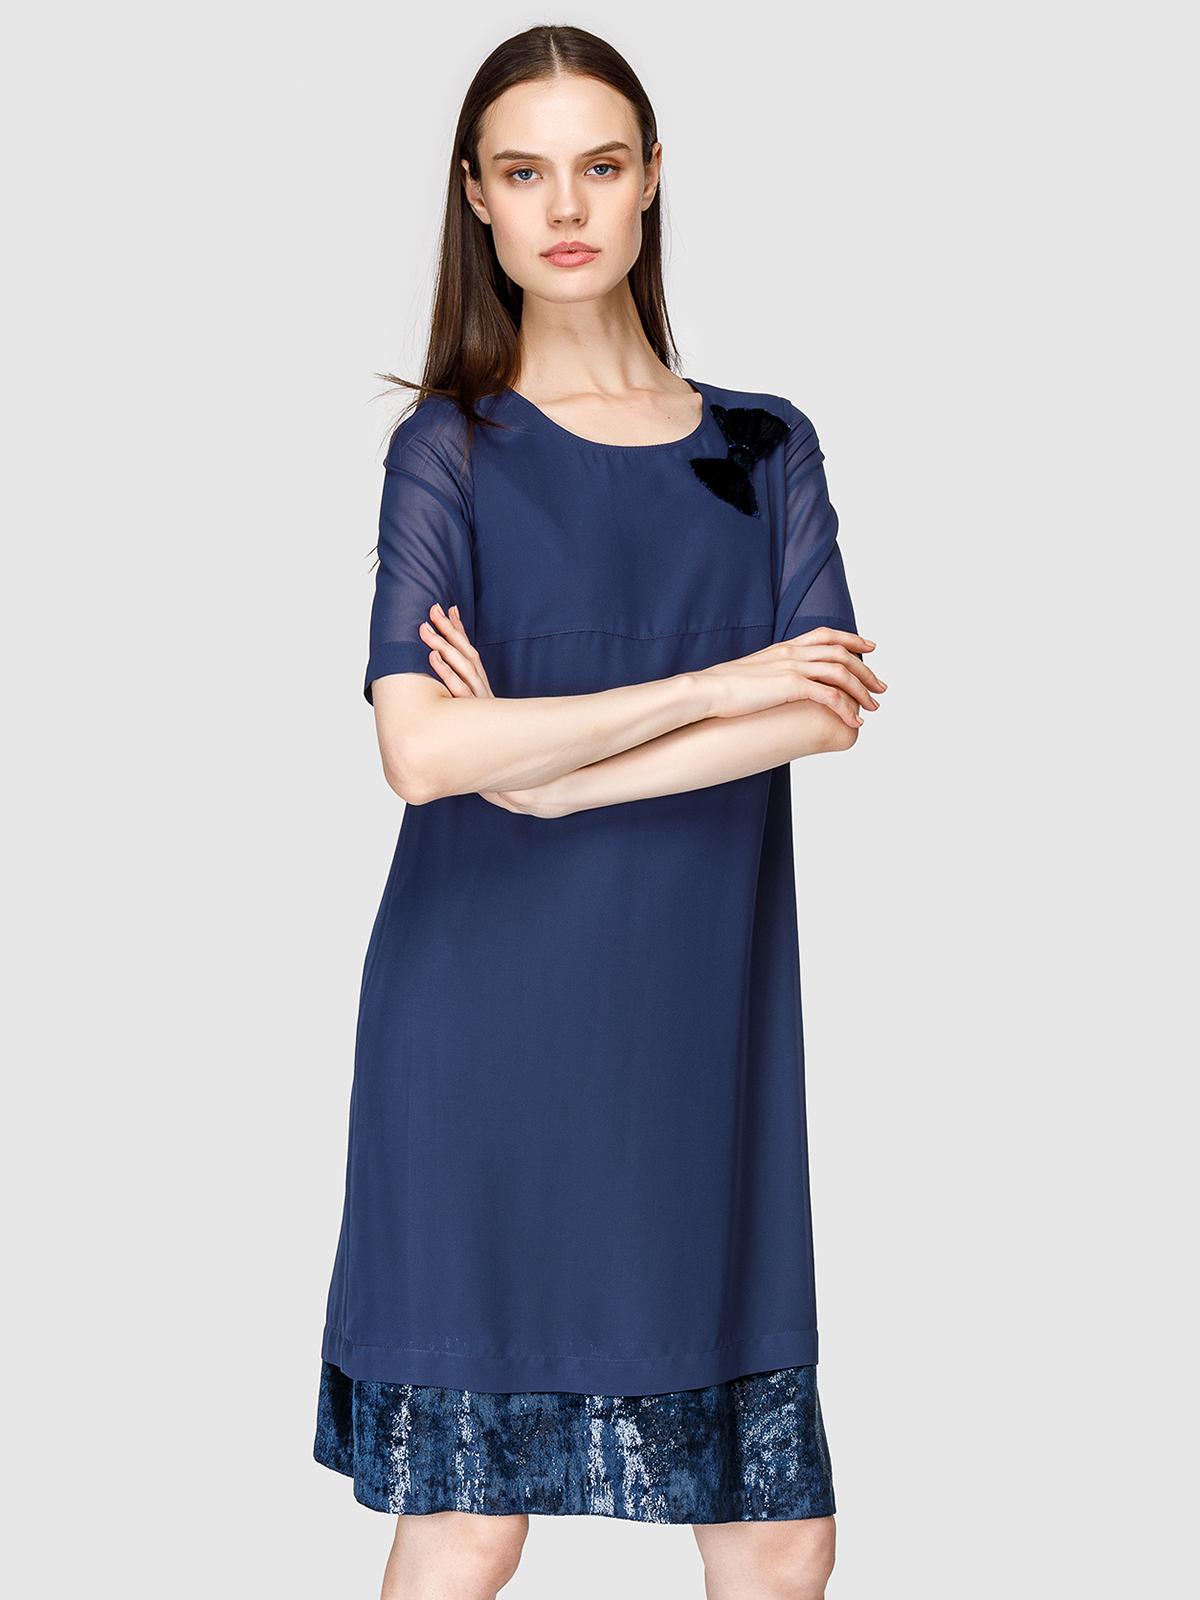 Платье женское Helmidge 7875 синее 14 UK фото